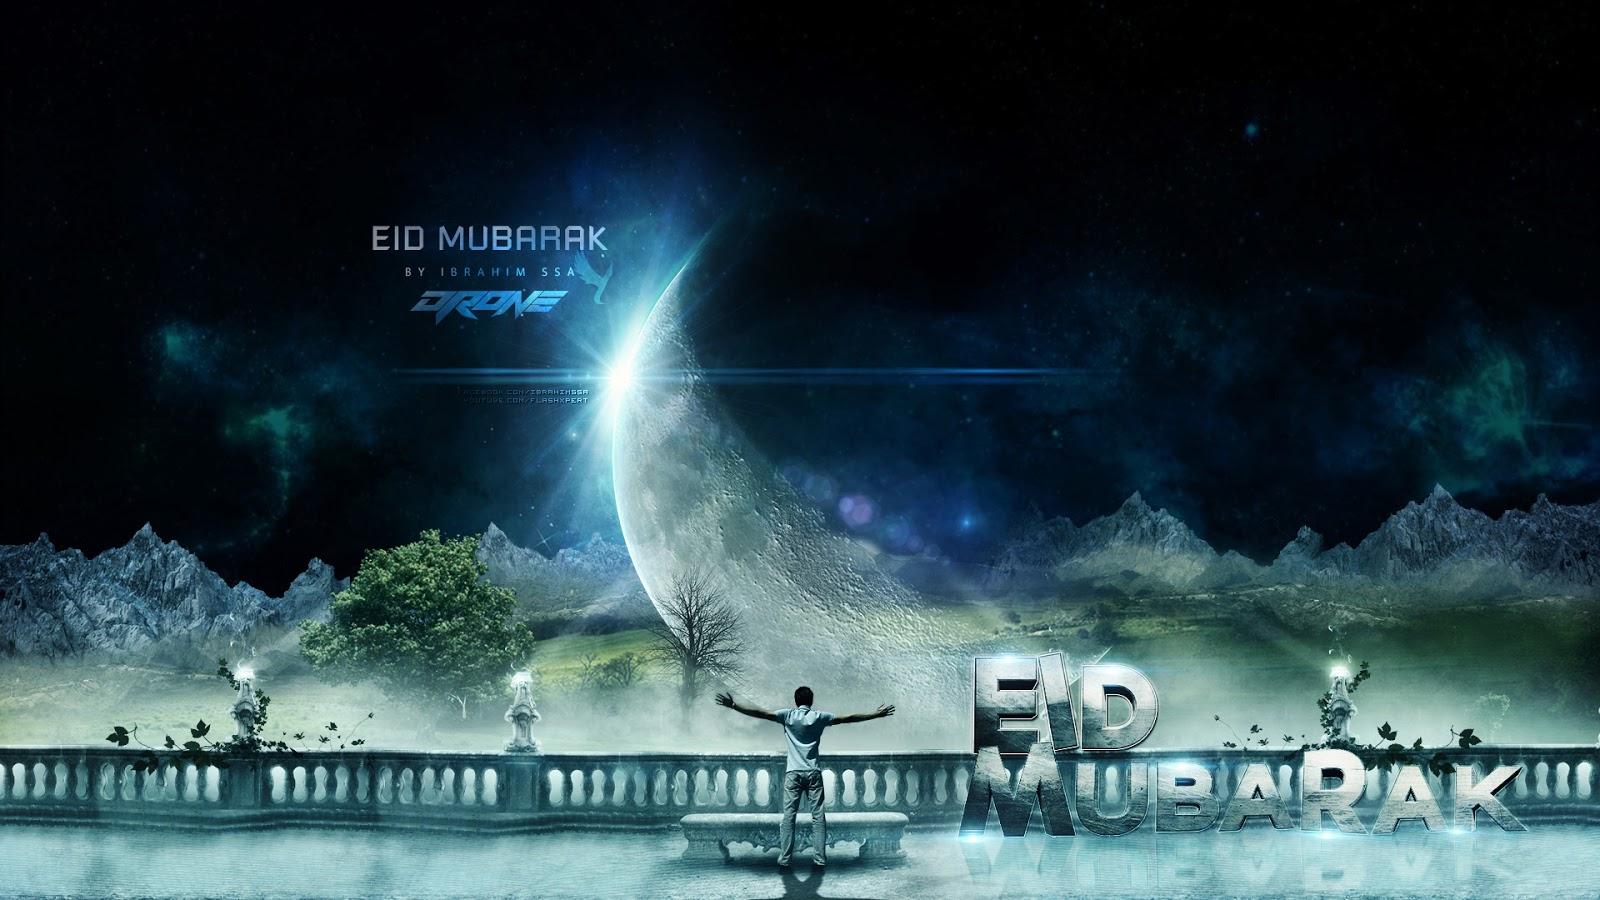 Eid Mubarak wallpaper 5